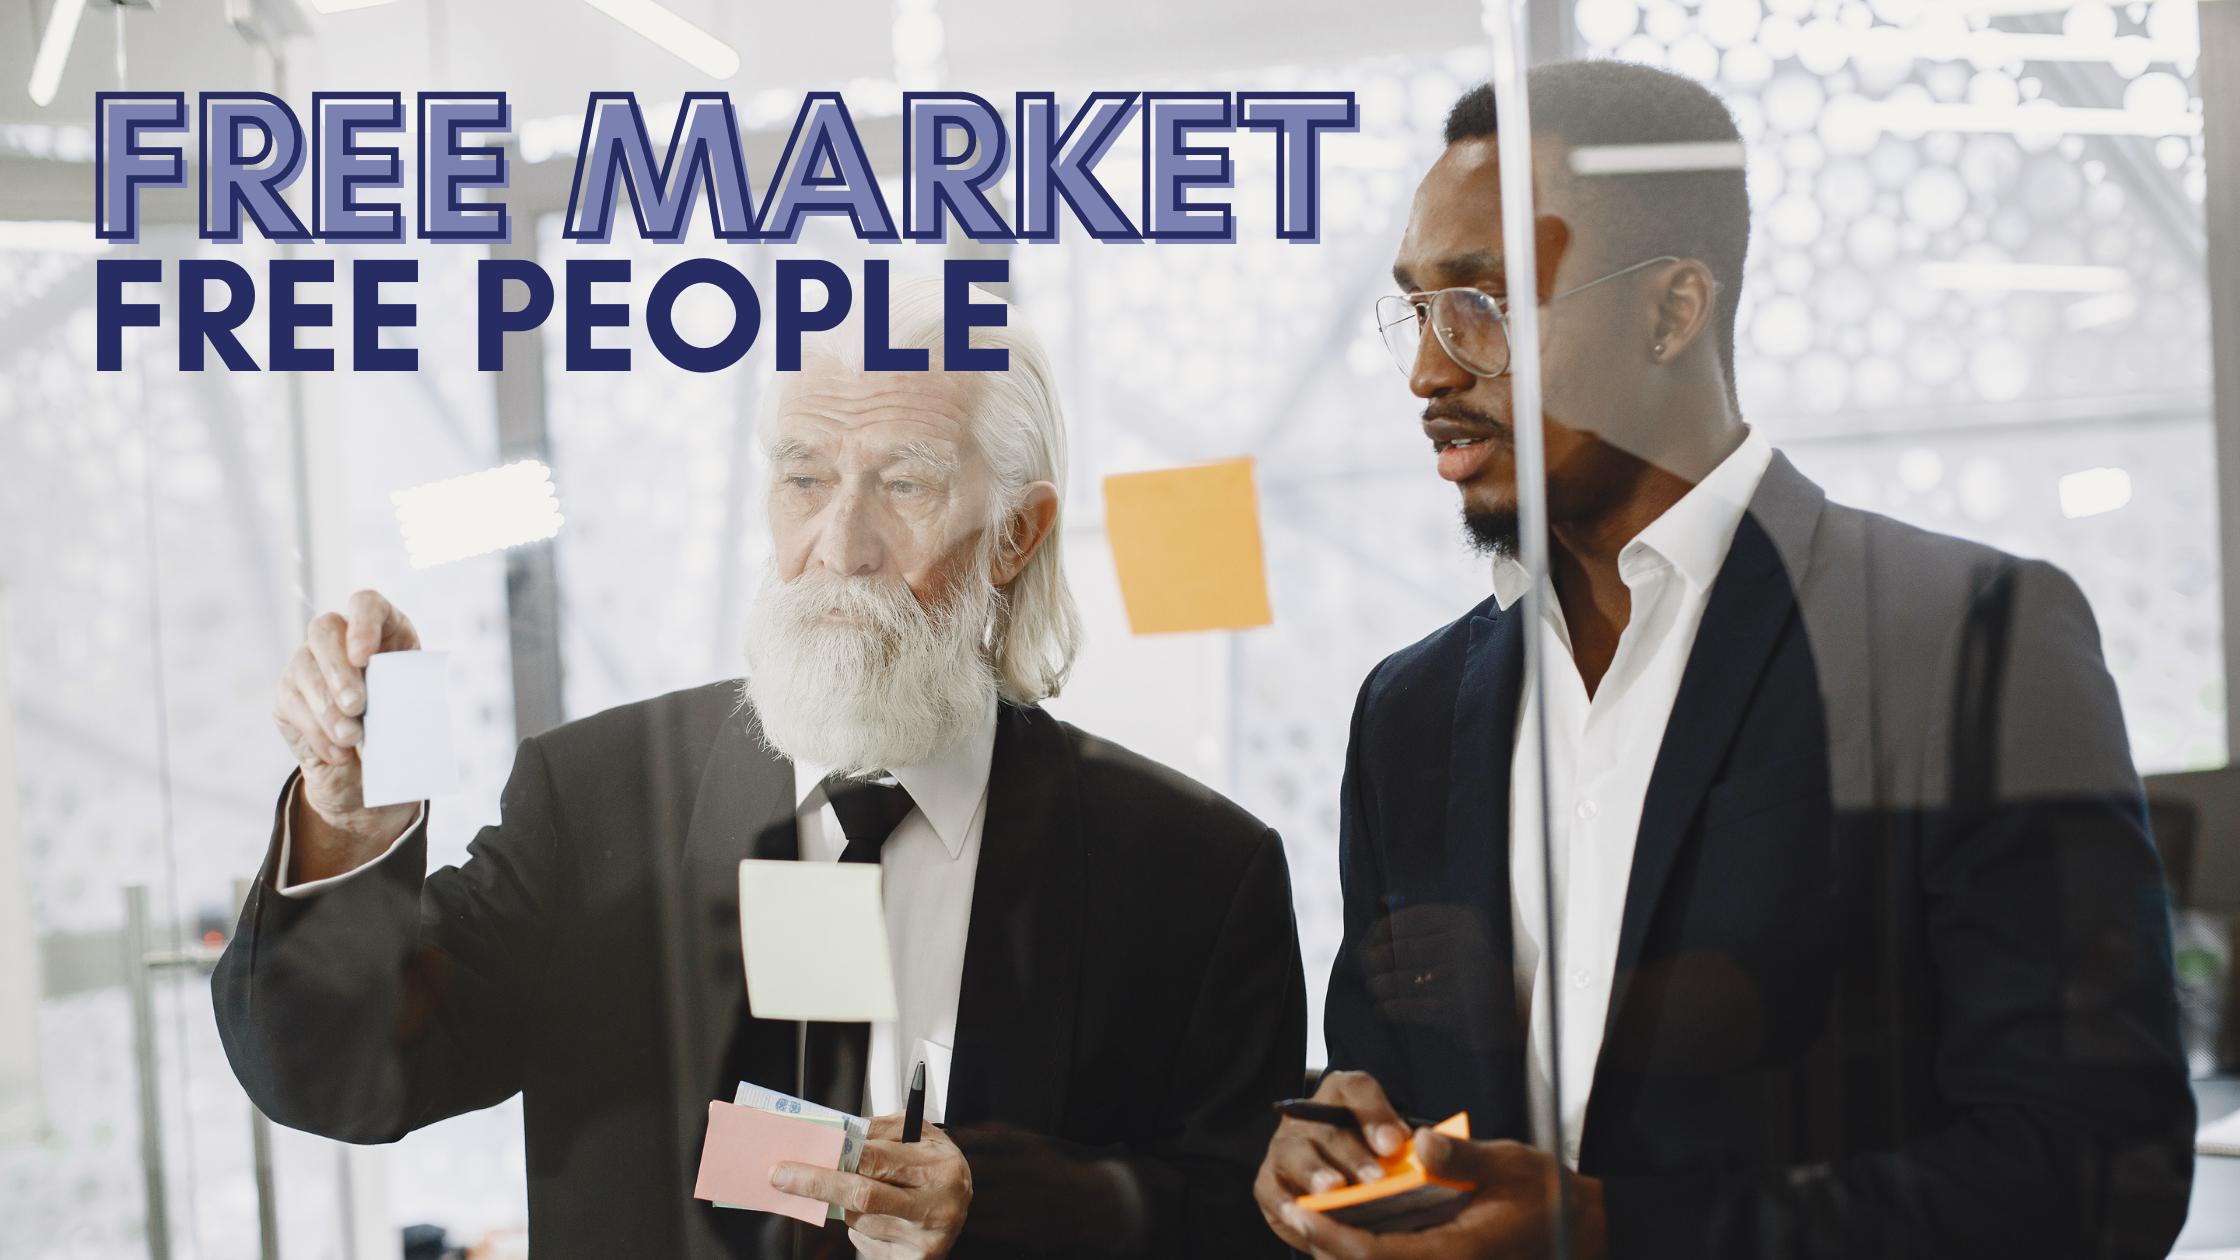 free market makes free people